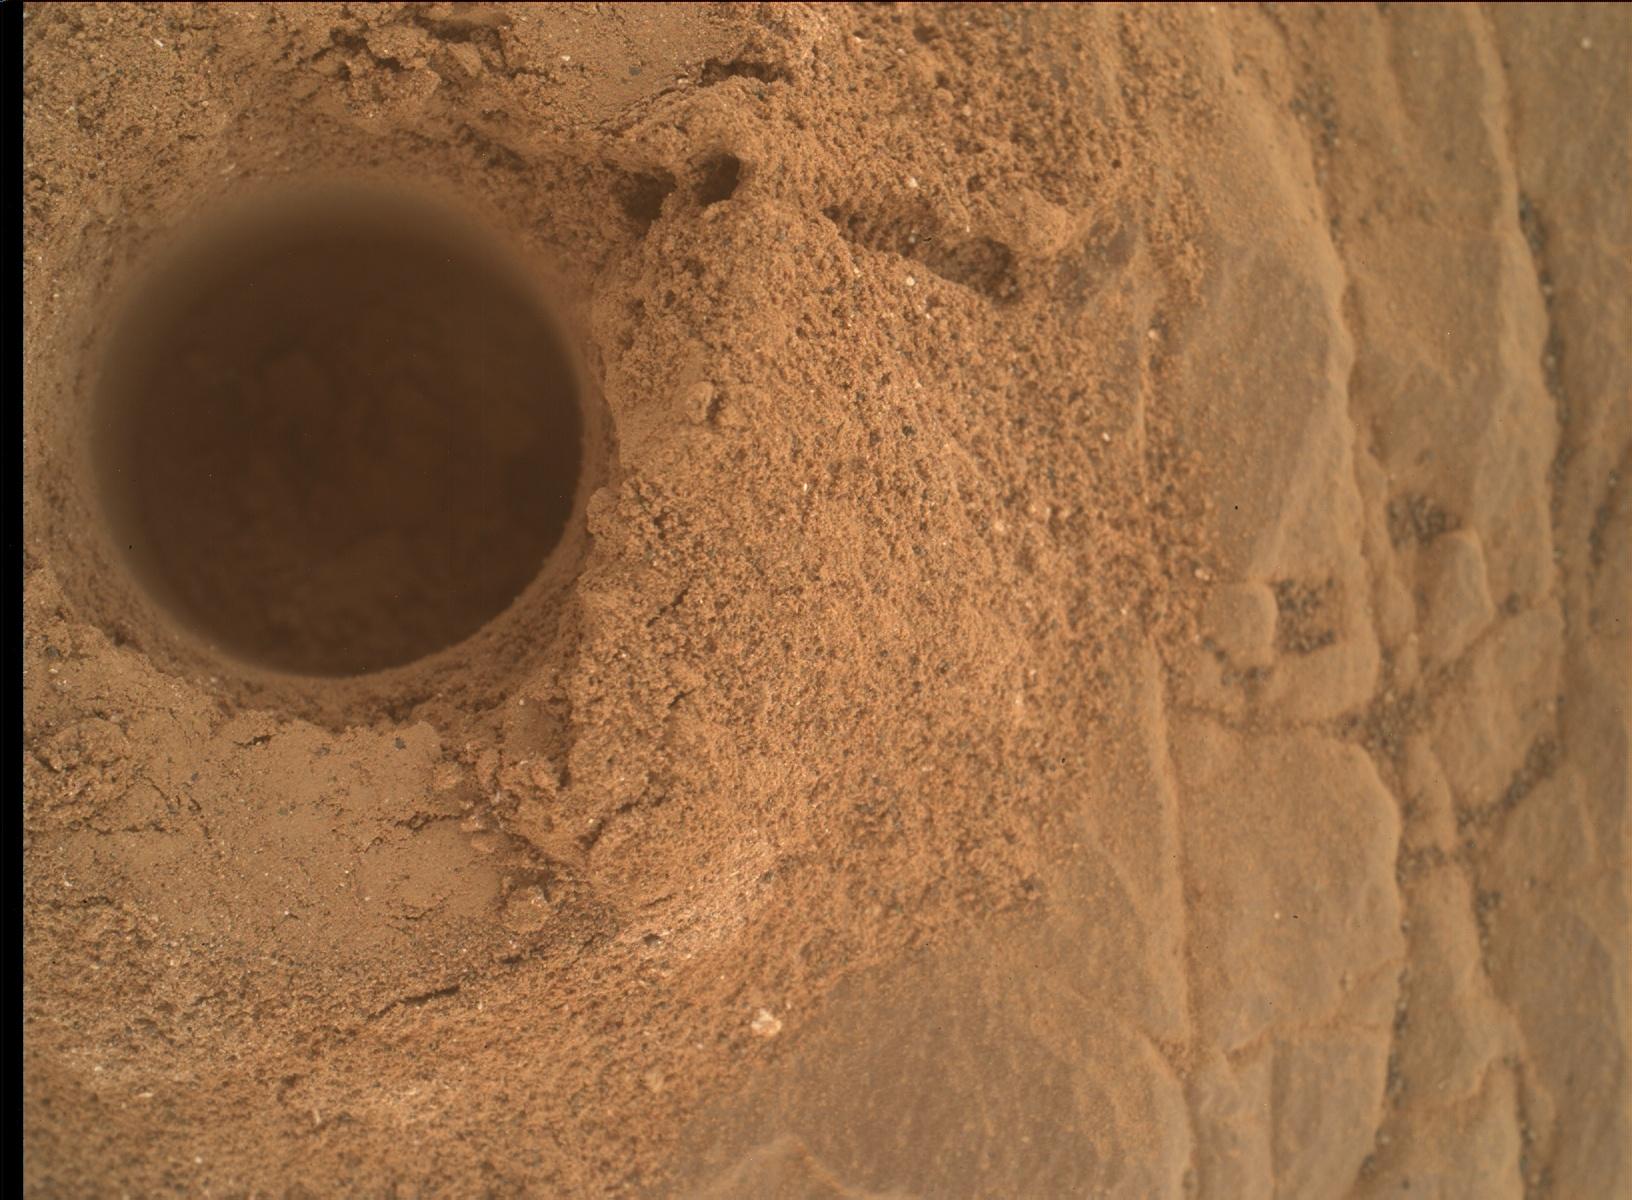 MARS: CURIOSITY u krateru  GALE Vol II. - Page 37 2381MH0001220010900225C00_DXXX